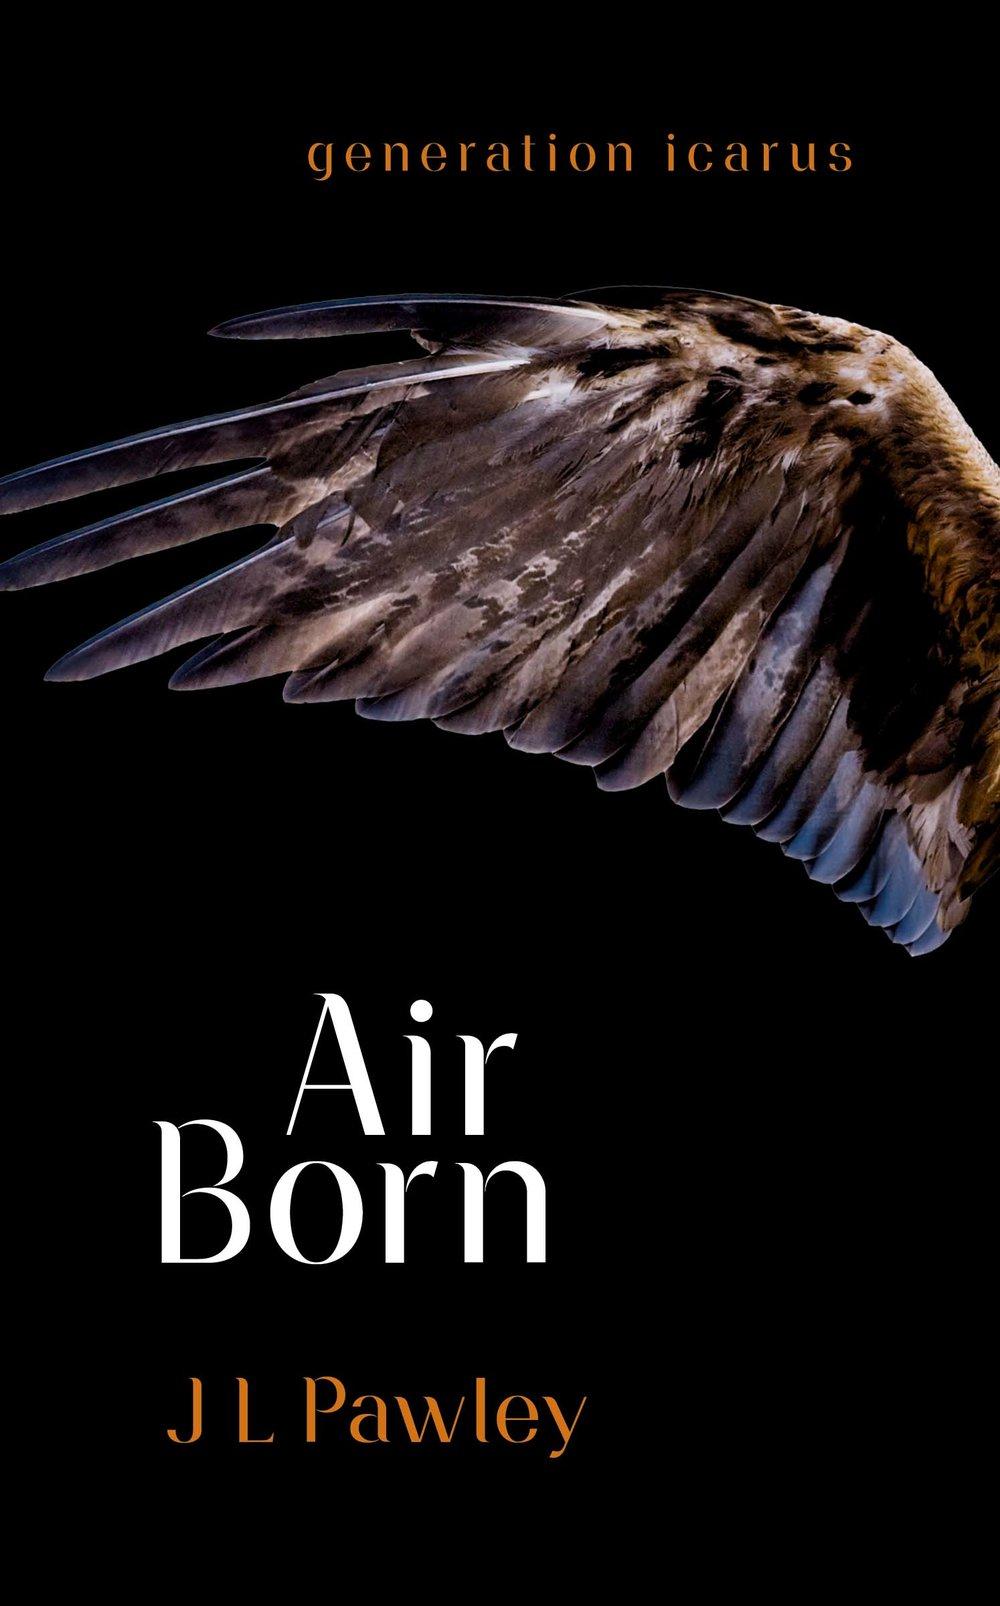 Air Born CVR_n.jpg